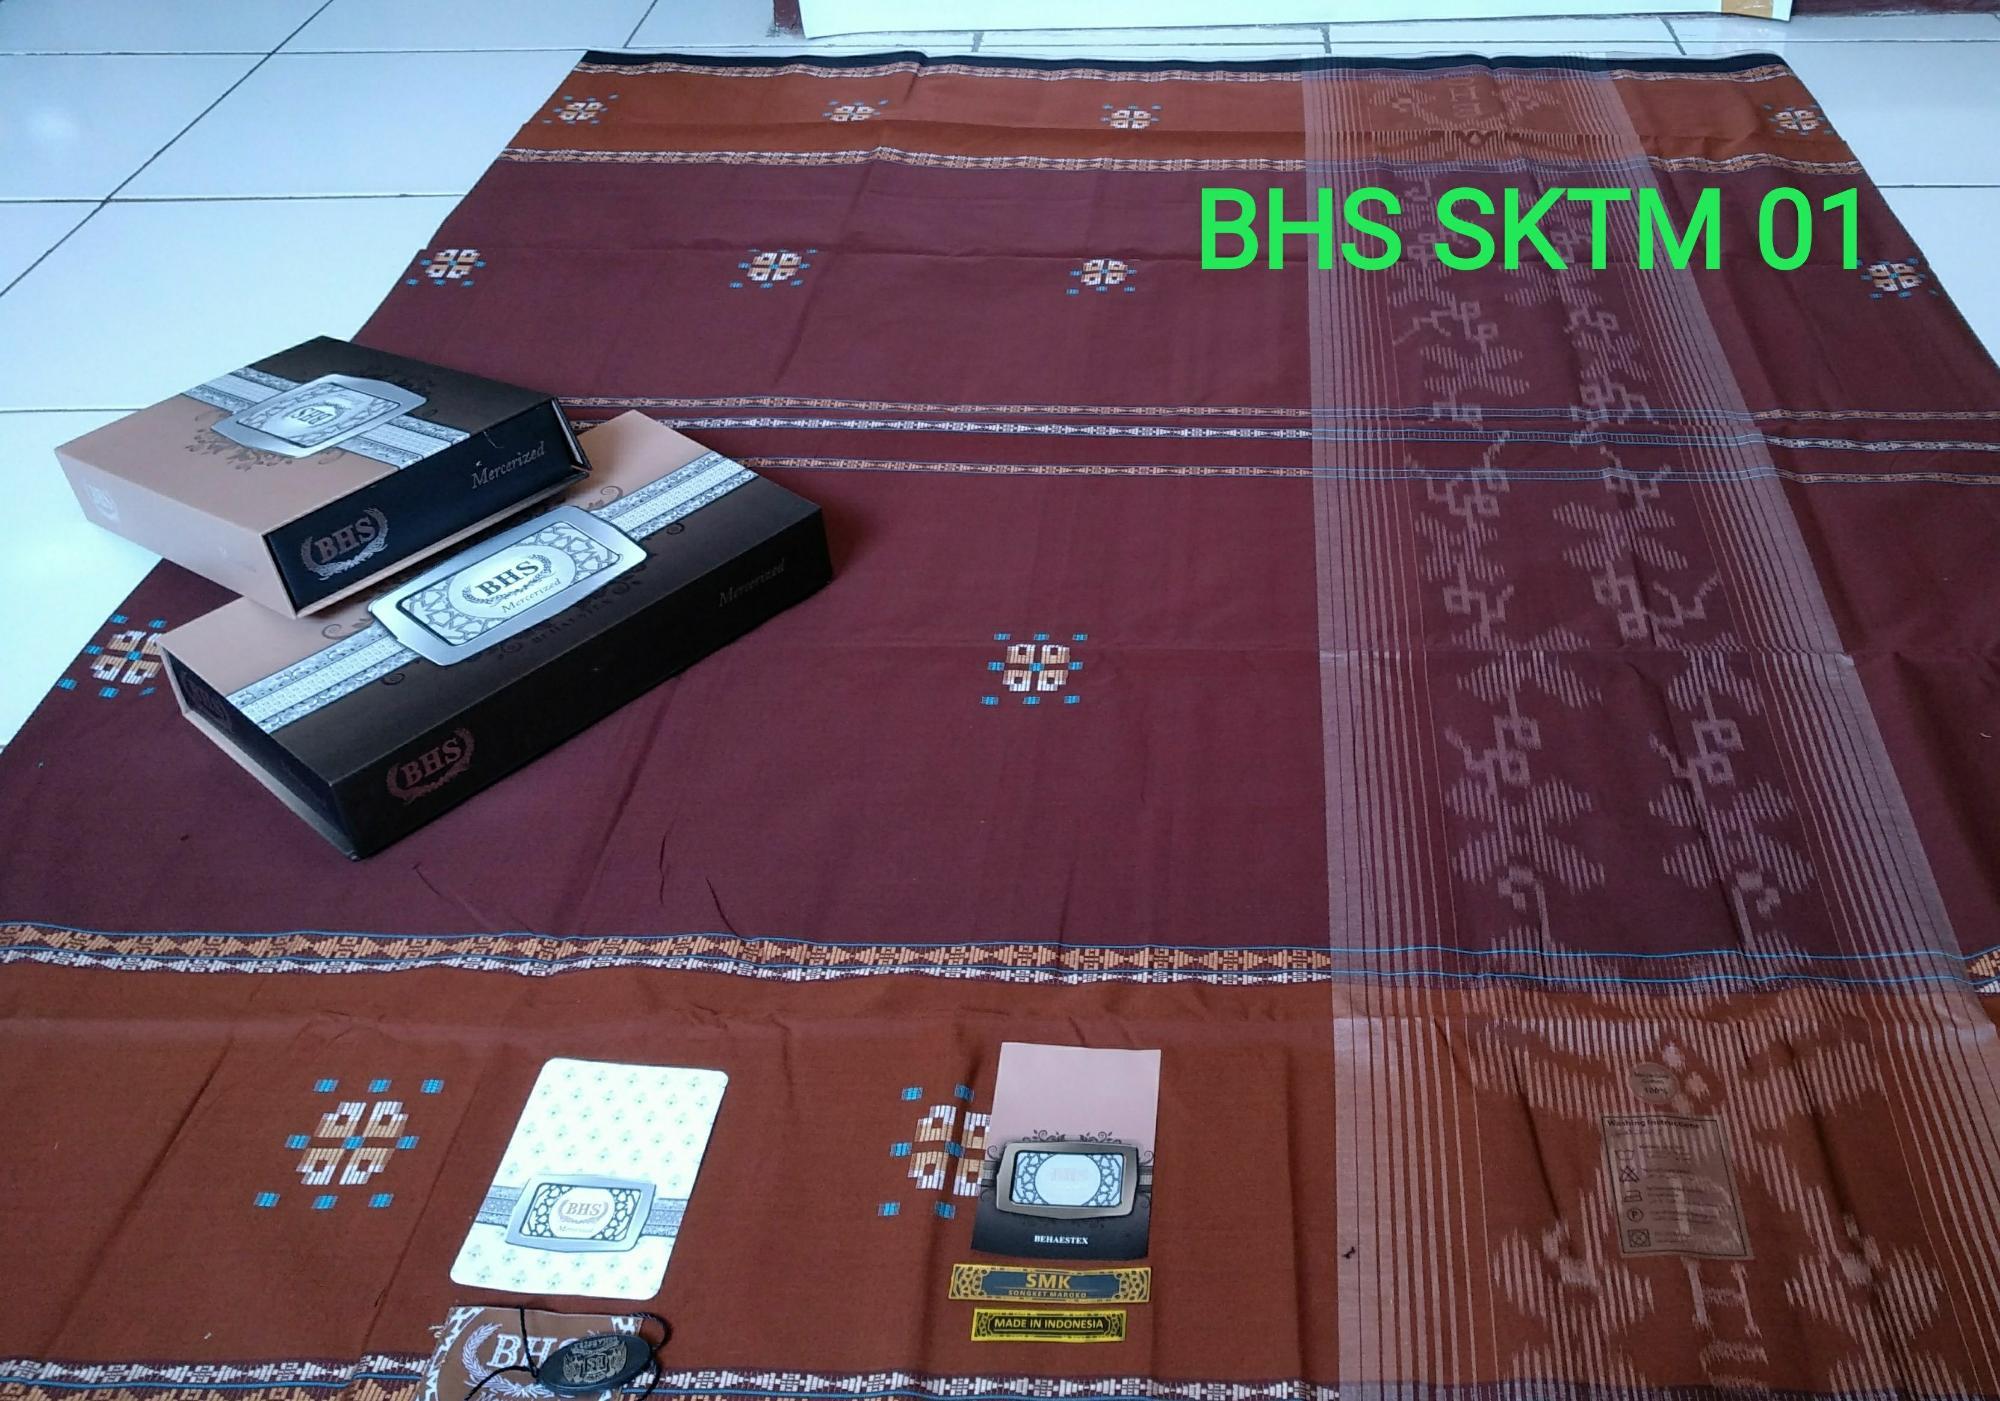 Sarung BHS Mercerized Songket Maroko/Sarung BHS/Sarung BHS Songket/Sarung BHS SMK/Sarung Atlas BHS- Original Product